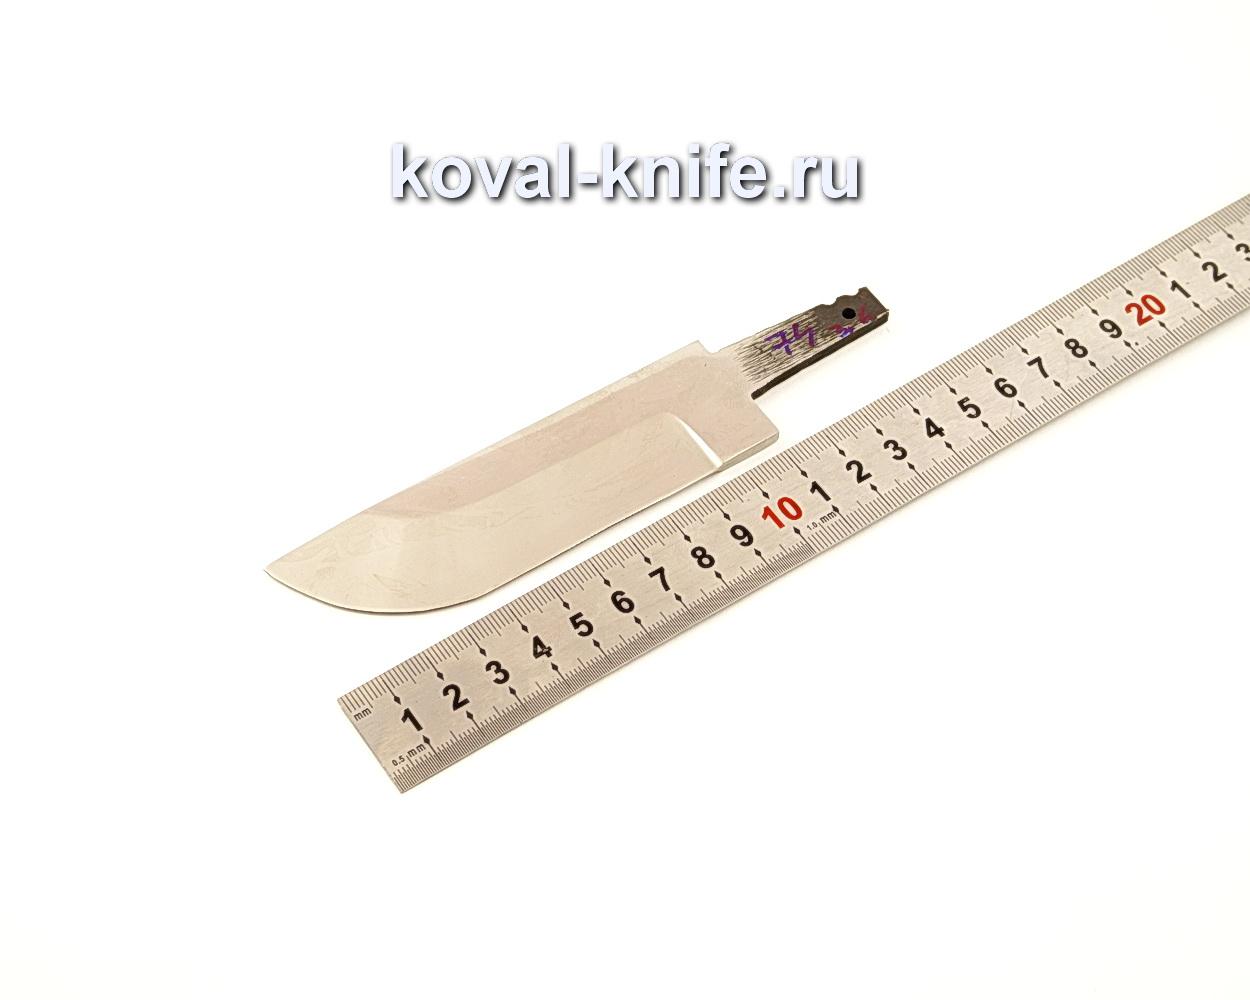 Клинок для ножа из кованой 95Х18 N74